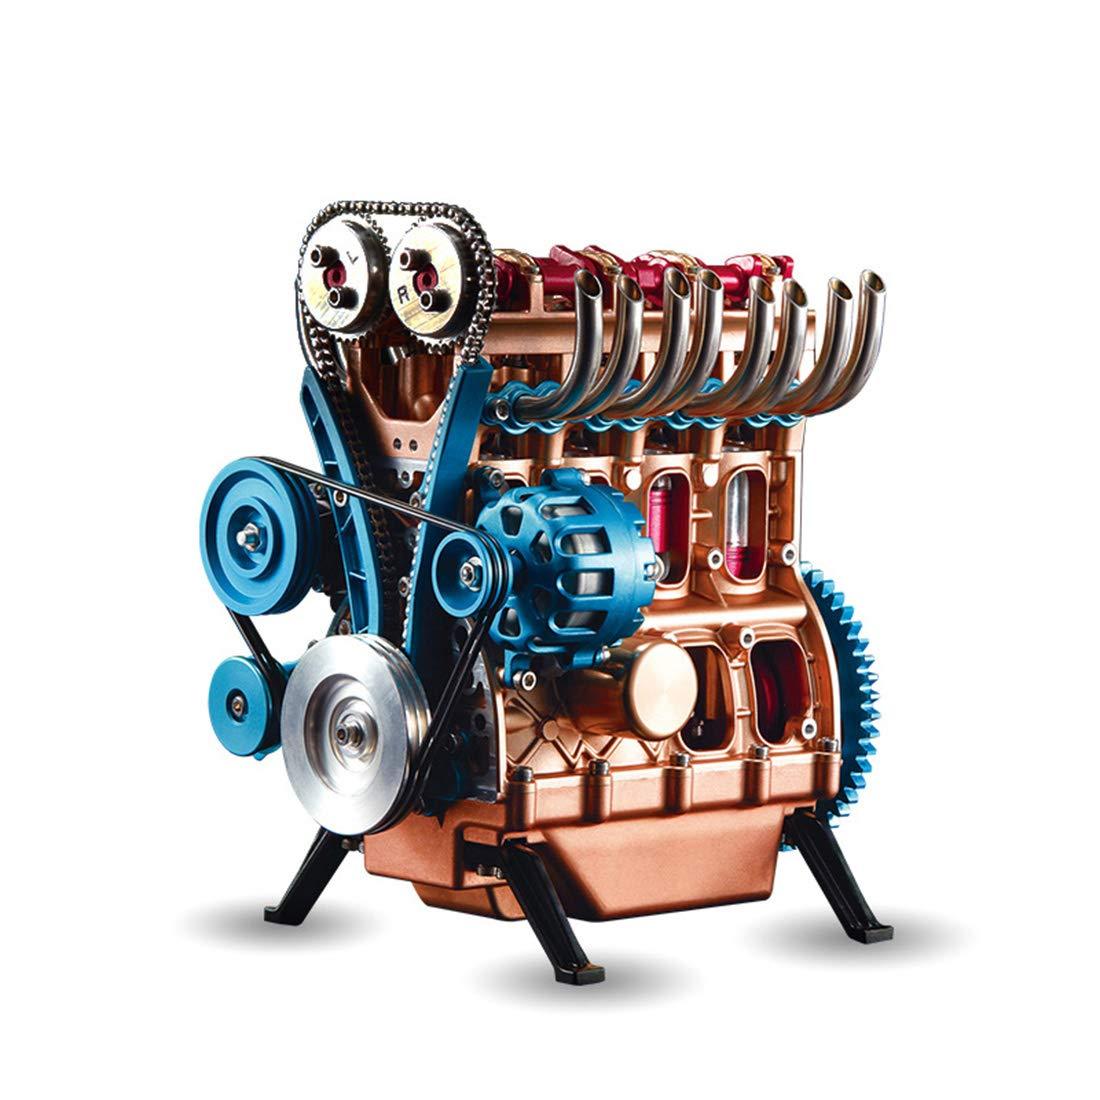 PeleusTech® DIY Stirling Engine All-Metal Unassembled Stirling Engine Kit Desk Stirling Engine for Teaching, Gift - Four Cylinder